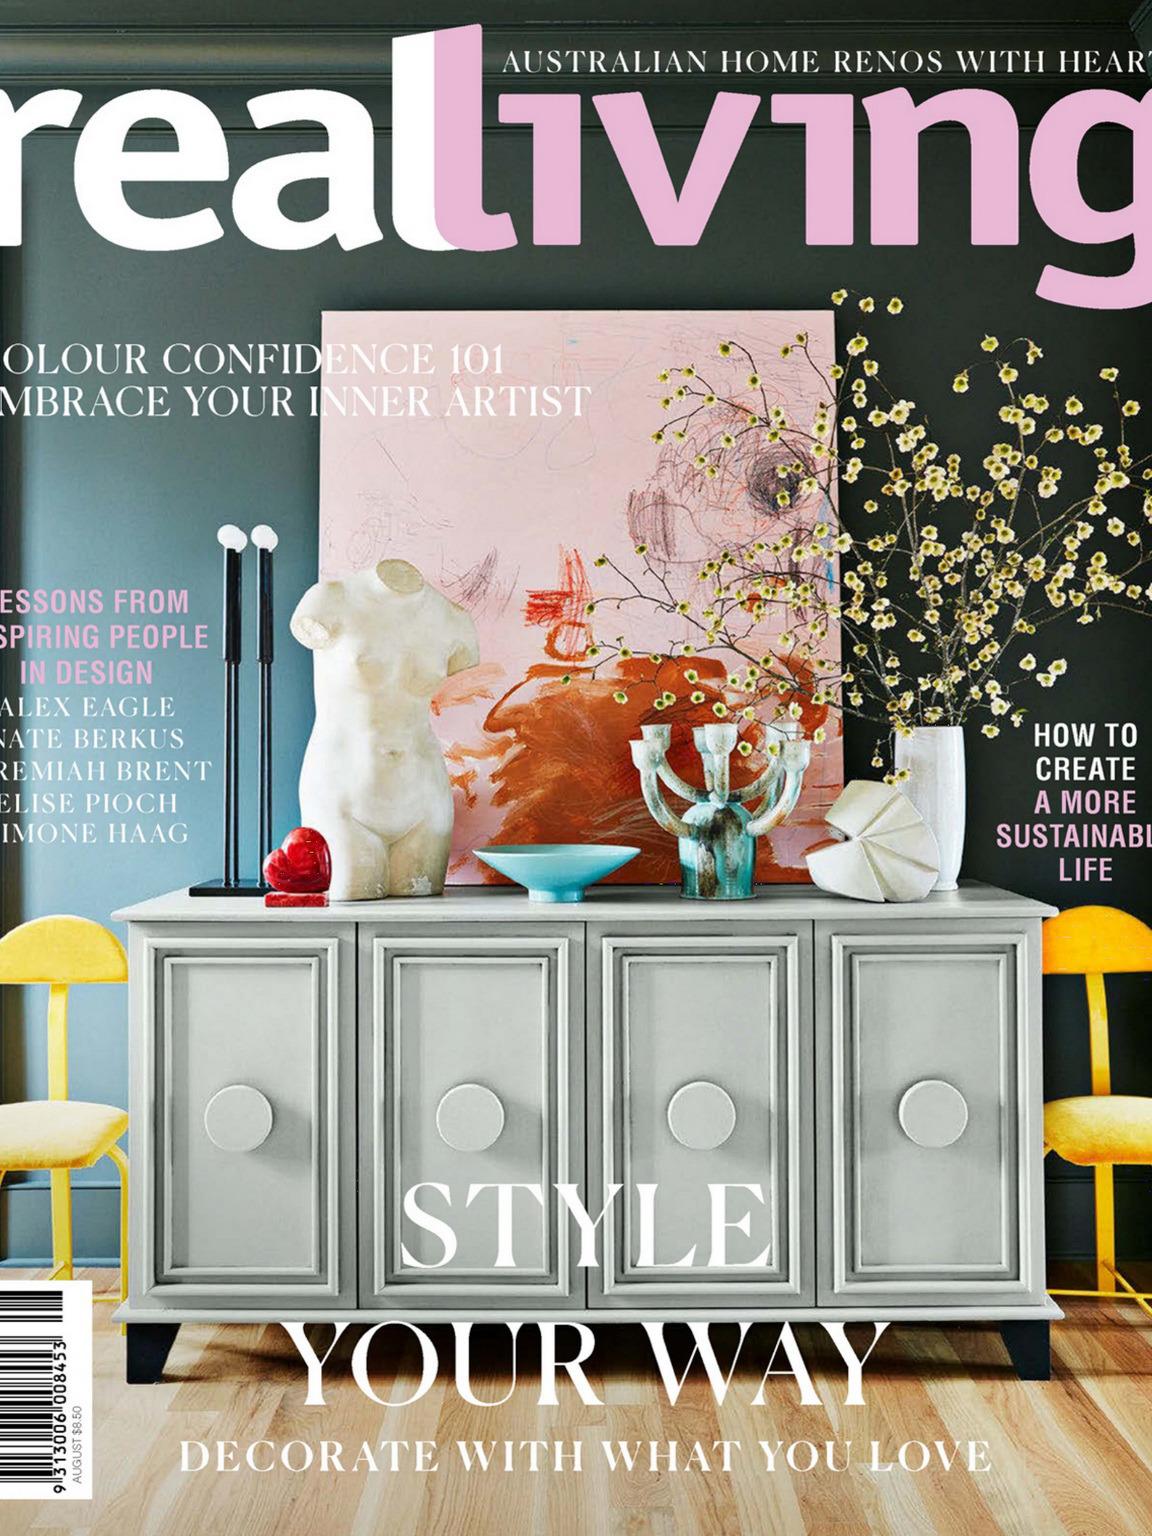 《Real Living》澳大利亚室内设计趋势杂志2020年08月号